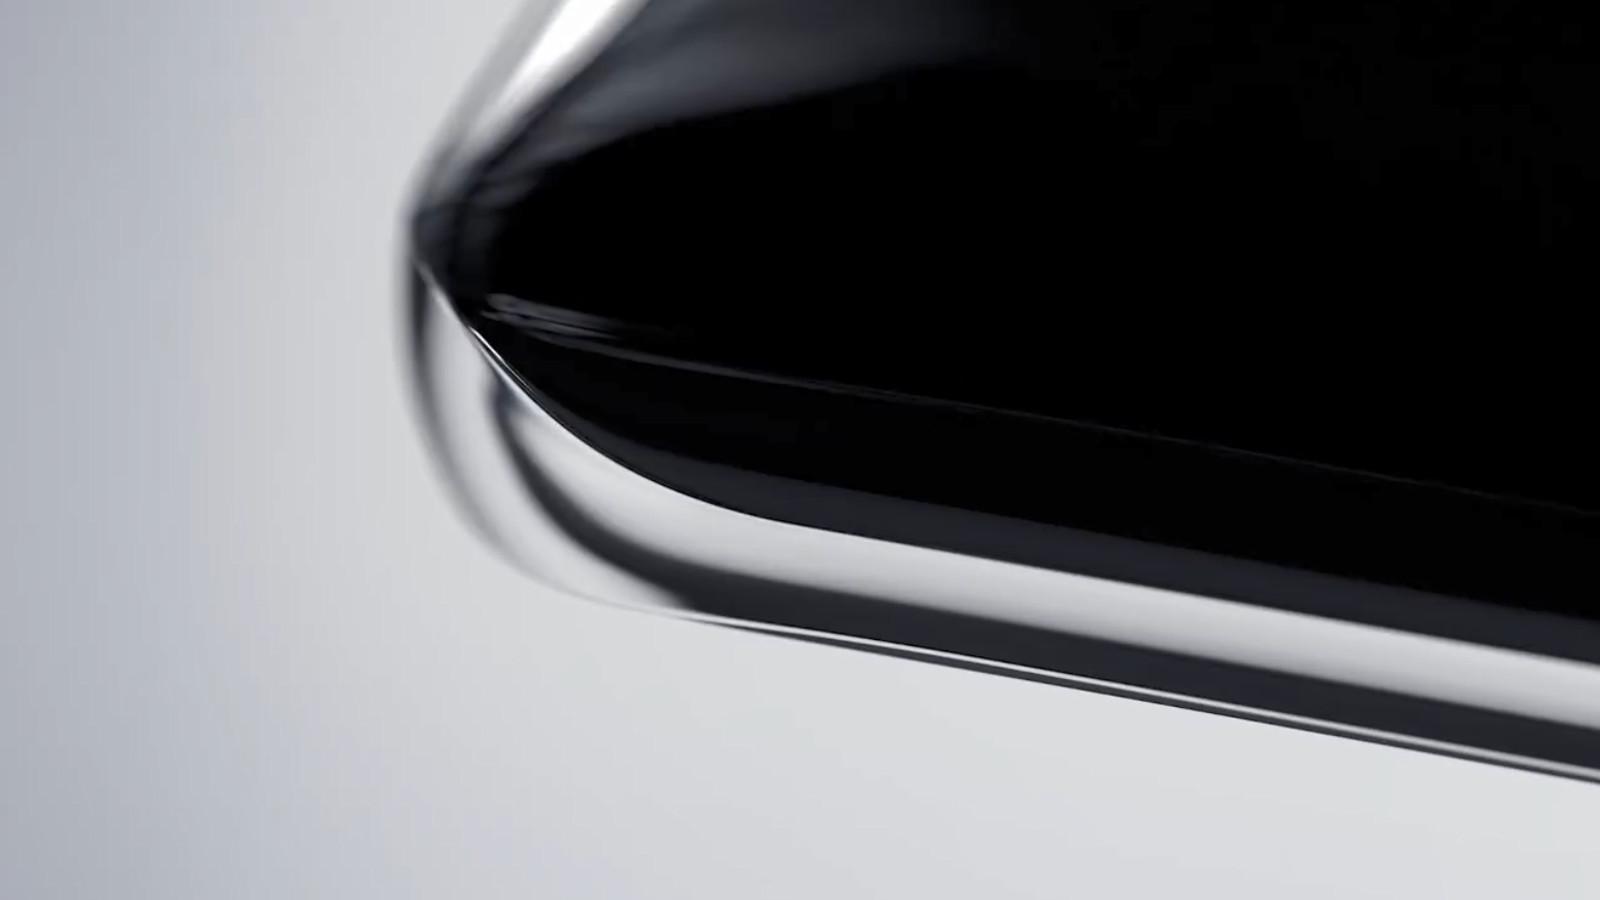 Huawei P40 Teaser